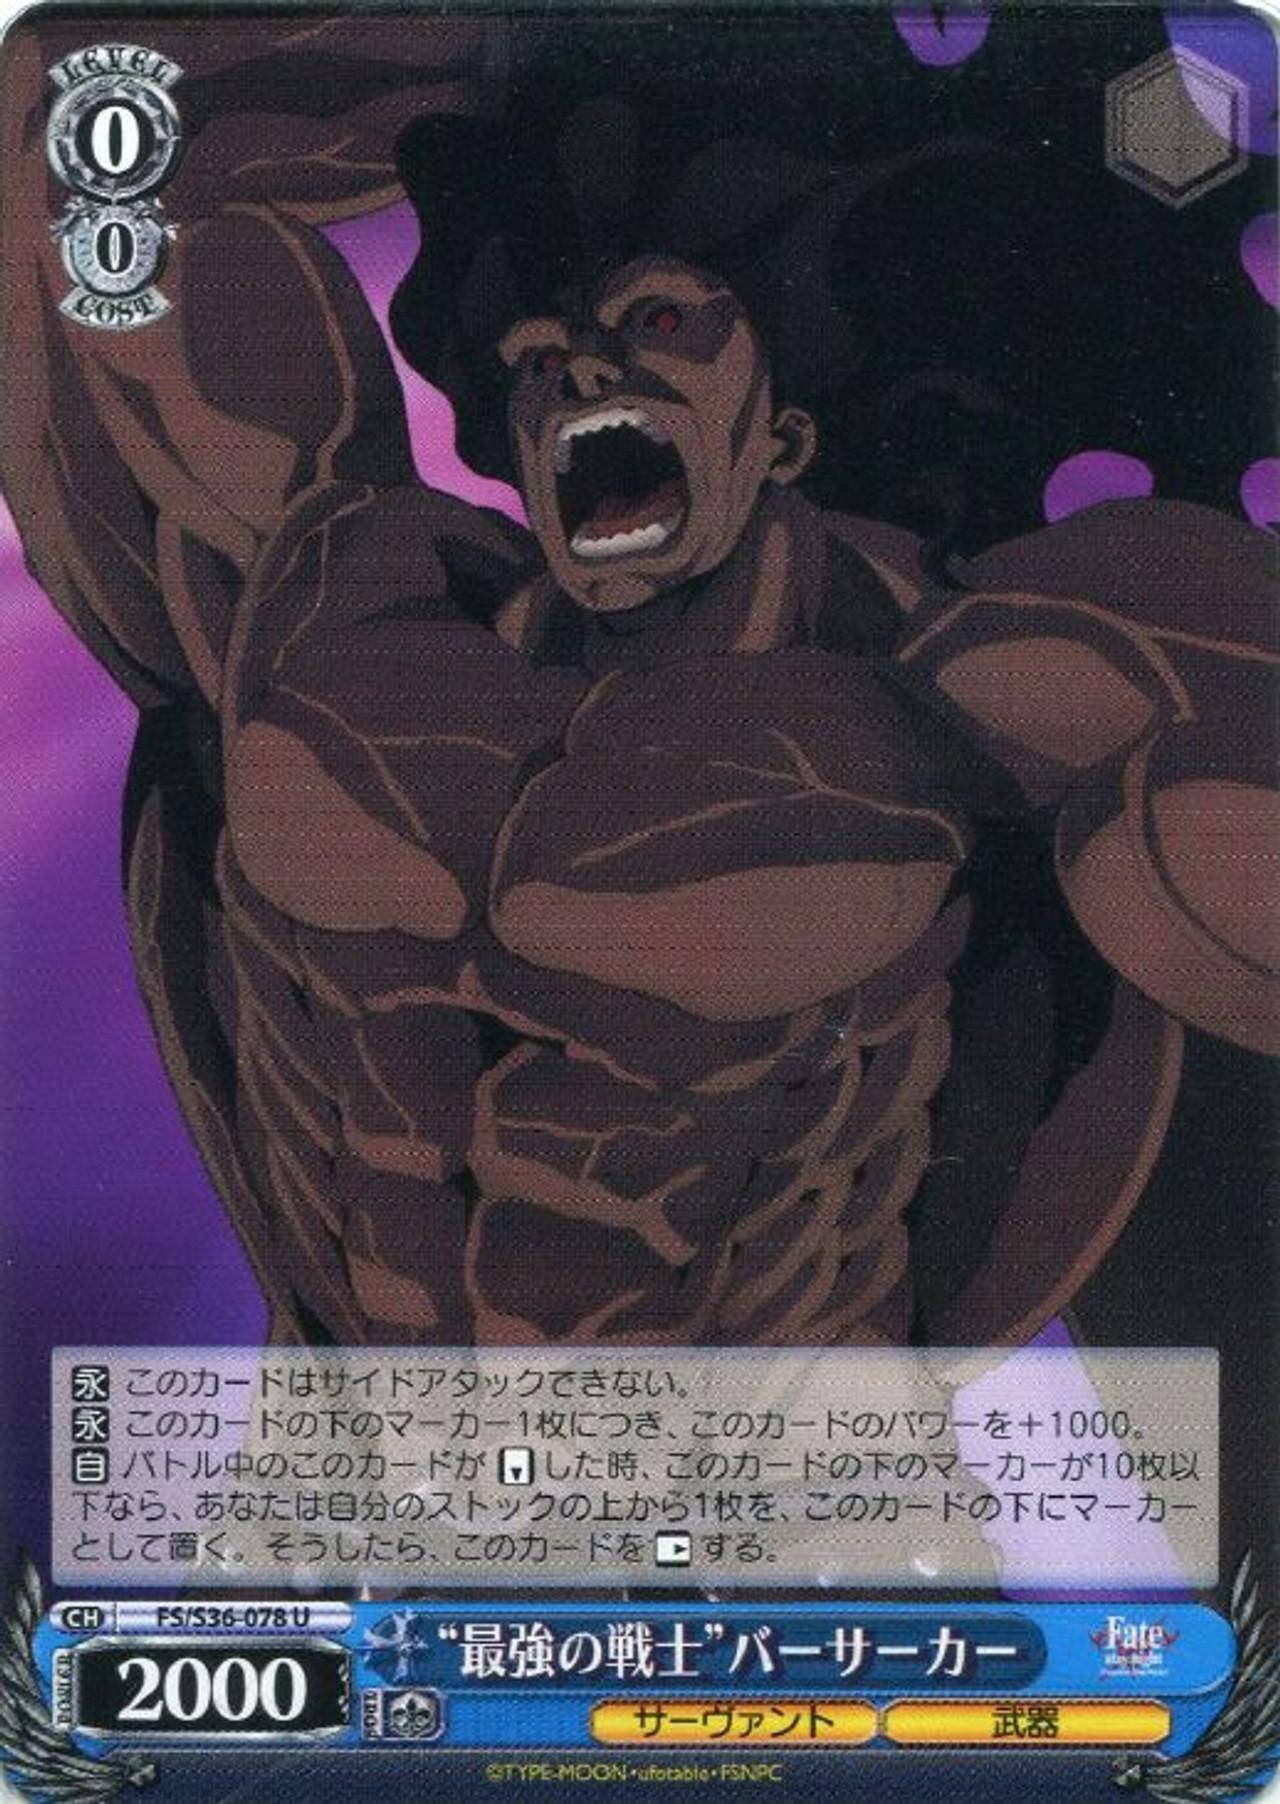 Weiss Schwarz Fate Stay Night Unlimited Blade Works Vol 2